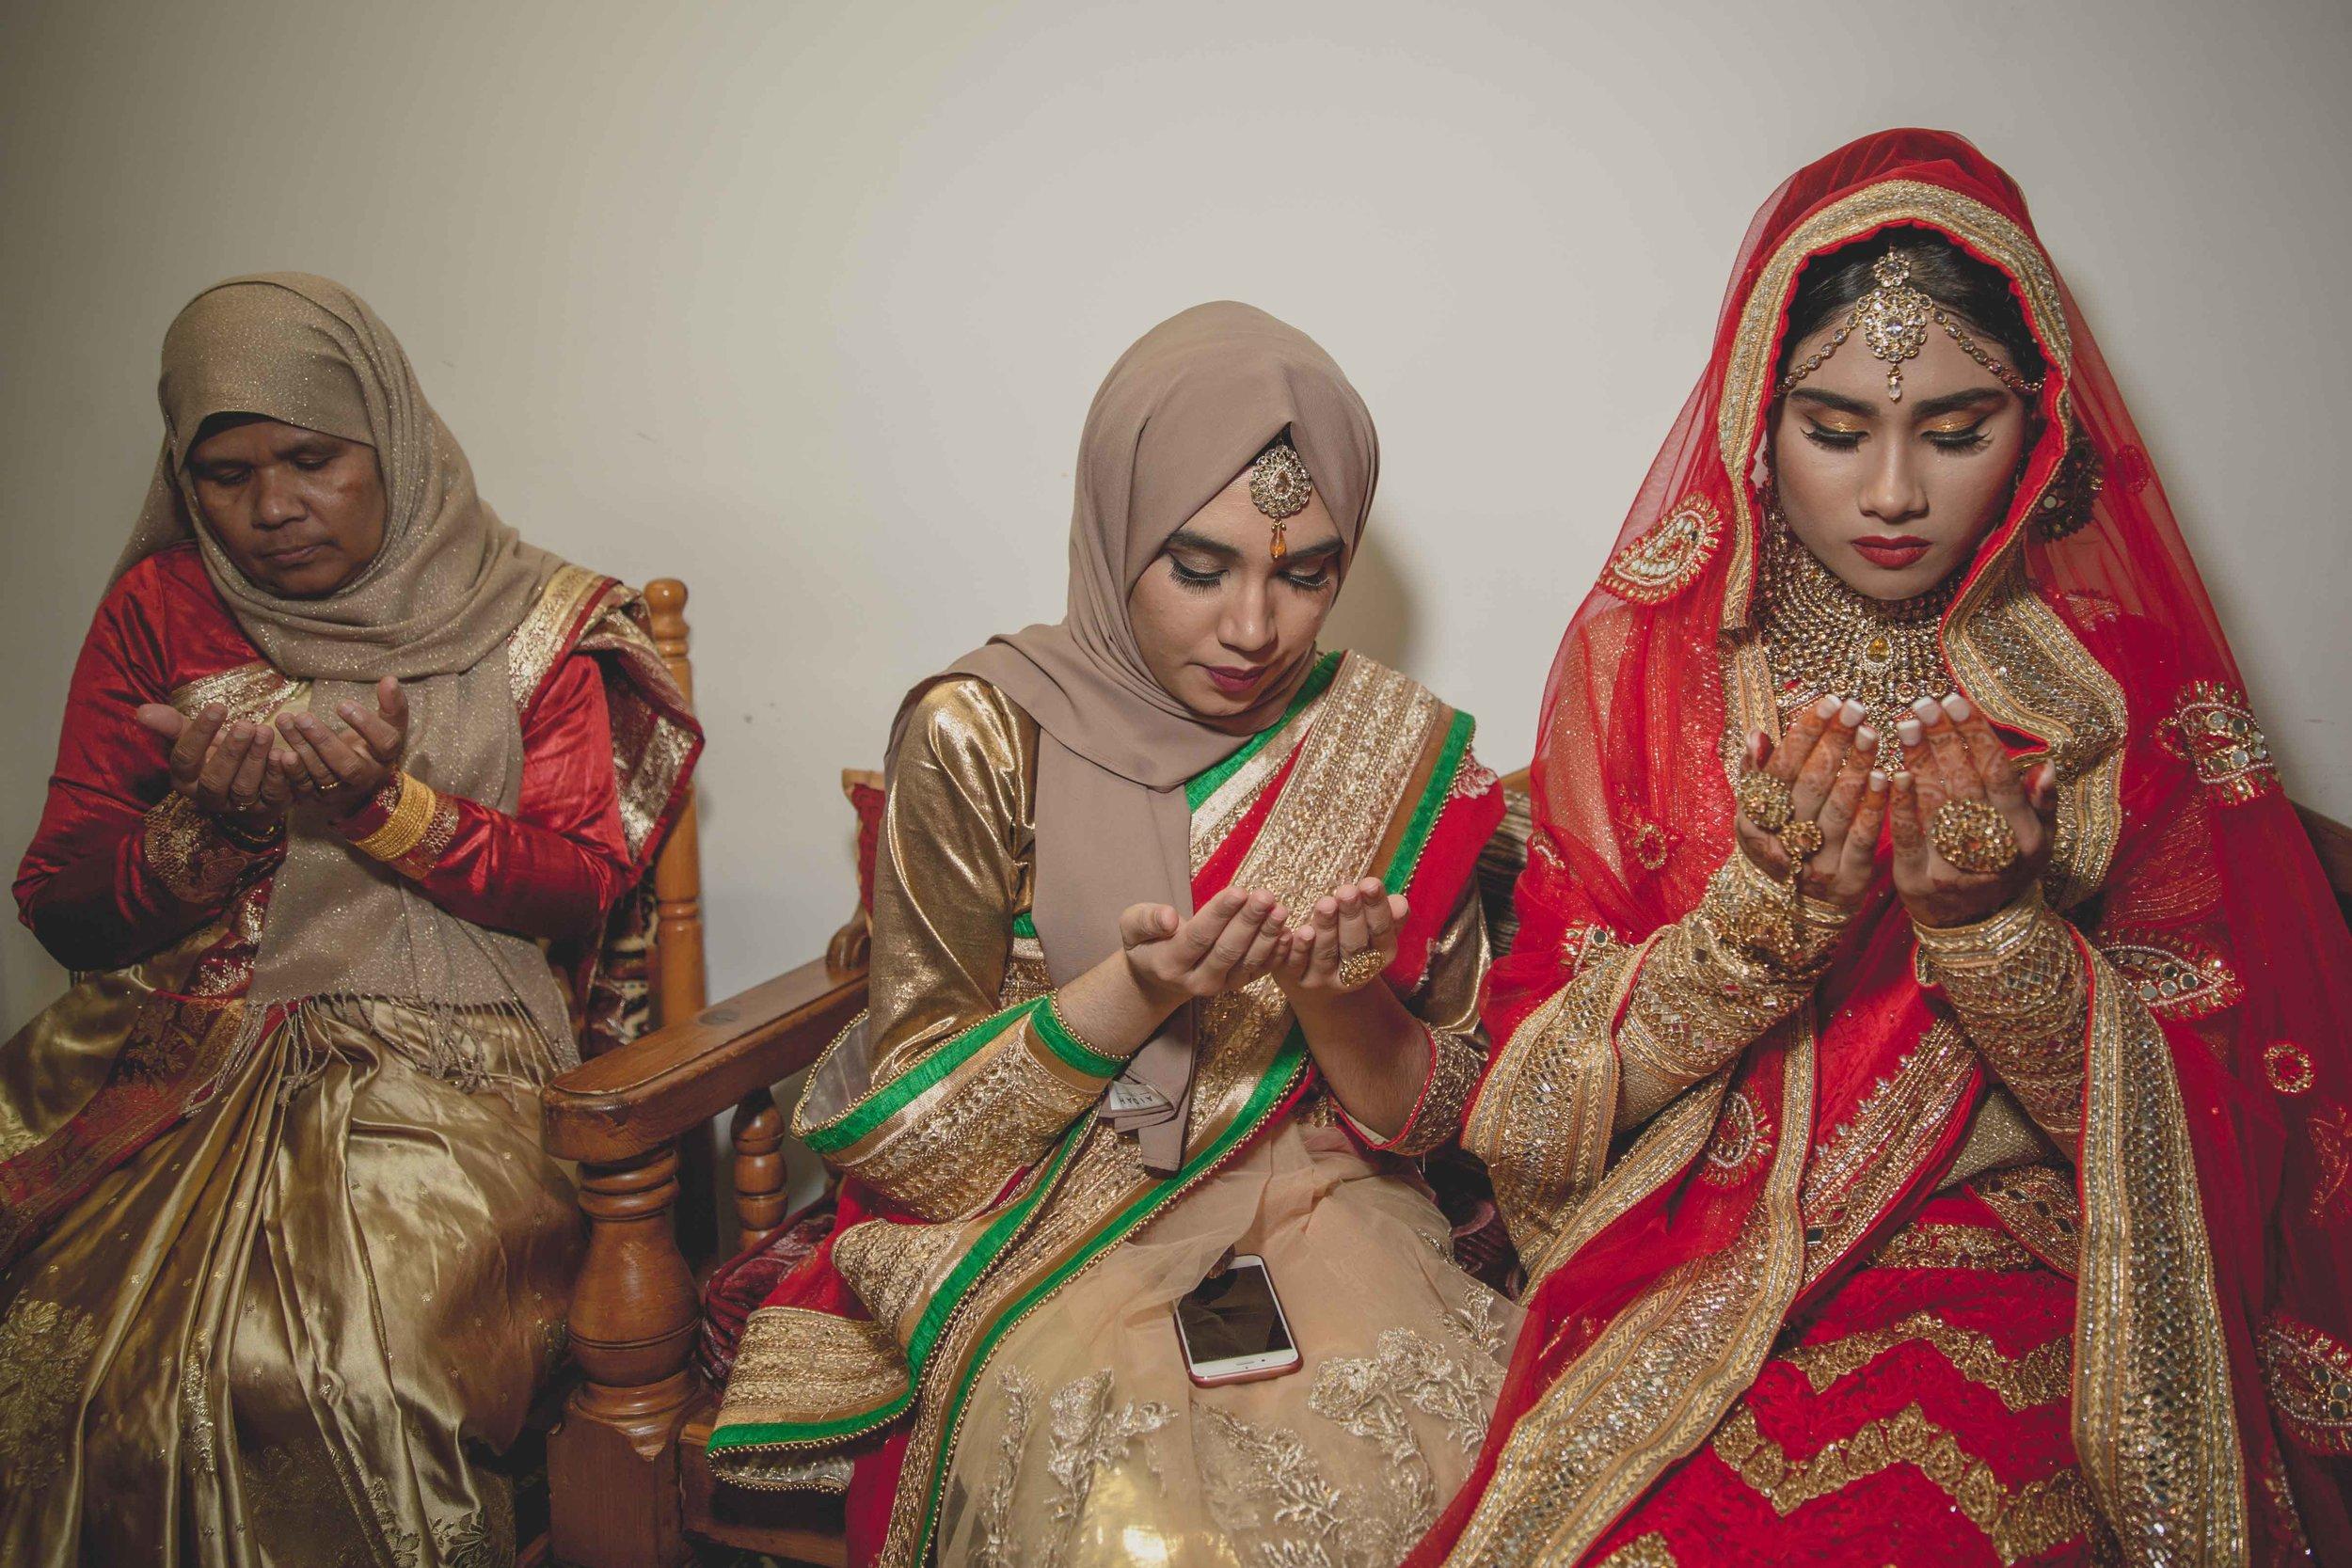 Female-wedding-photographer-birmingham-muslim-wedding-natalia-smith-photography-12.jpg